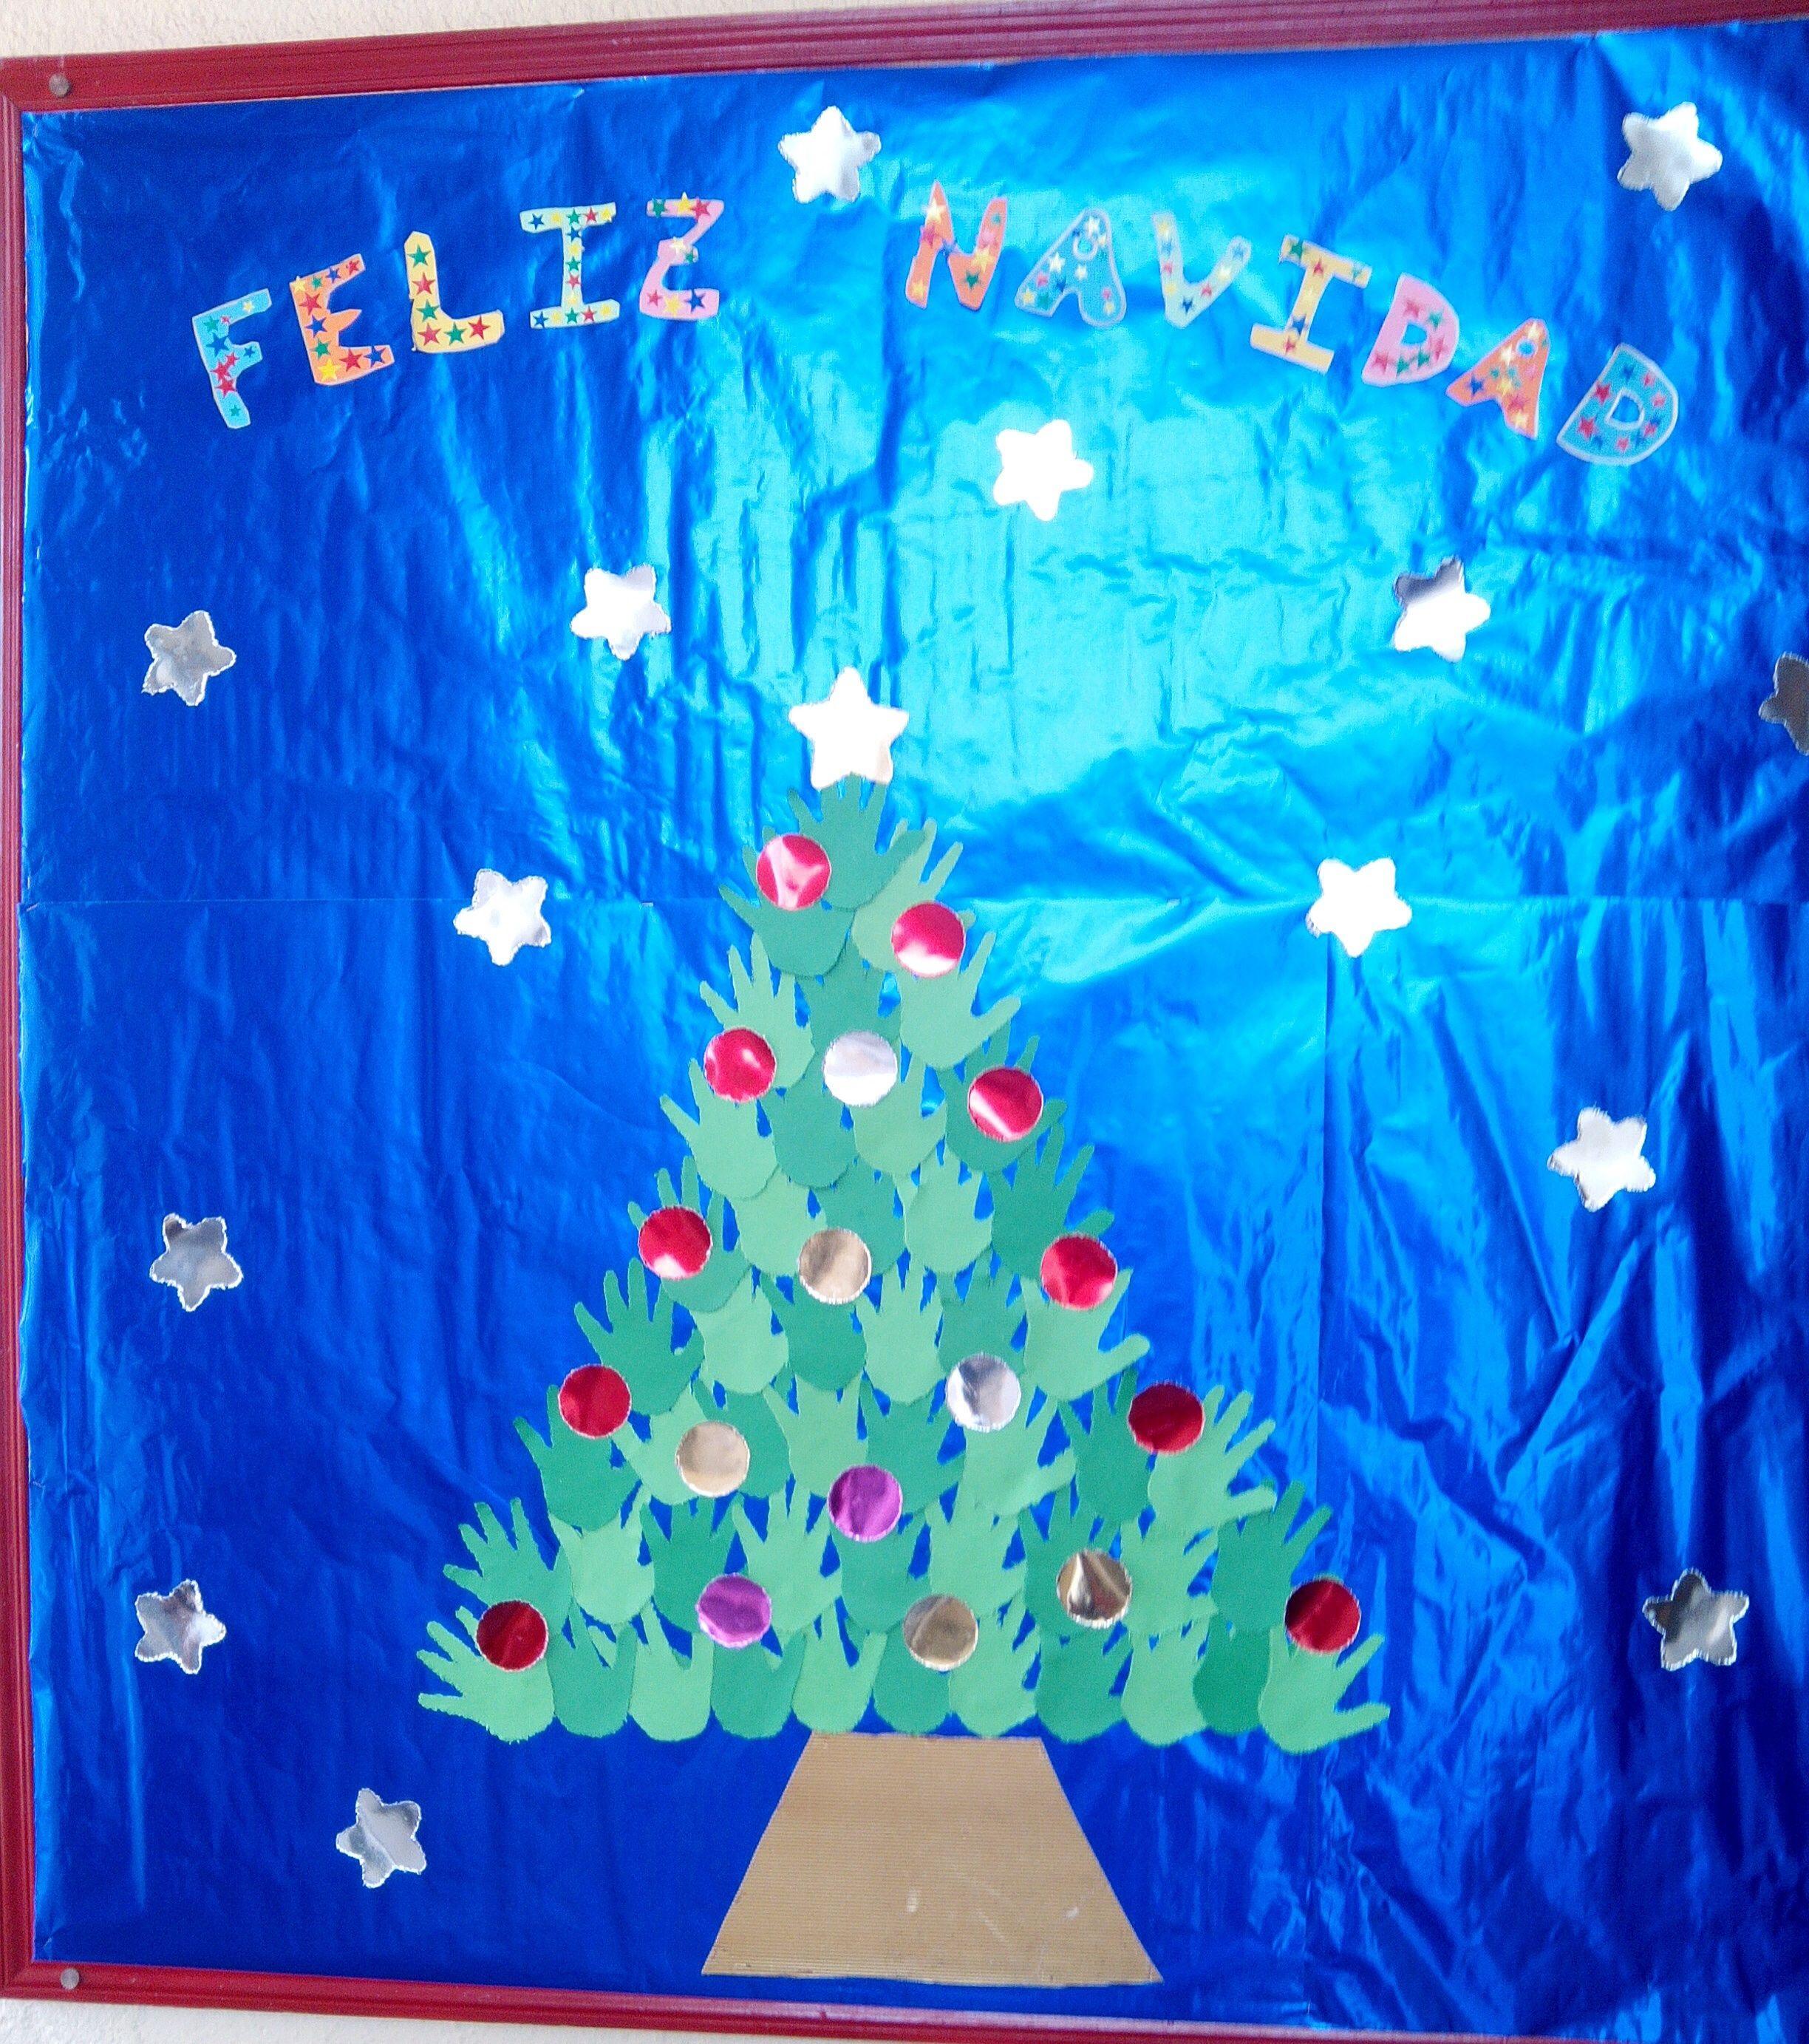 Mural navidad murales pinterest navidad murales de - Murales decorativos de navidad ...